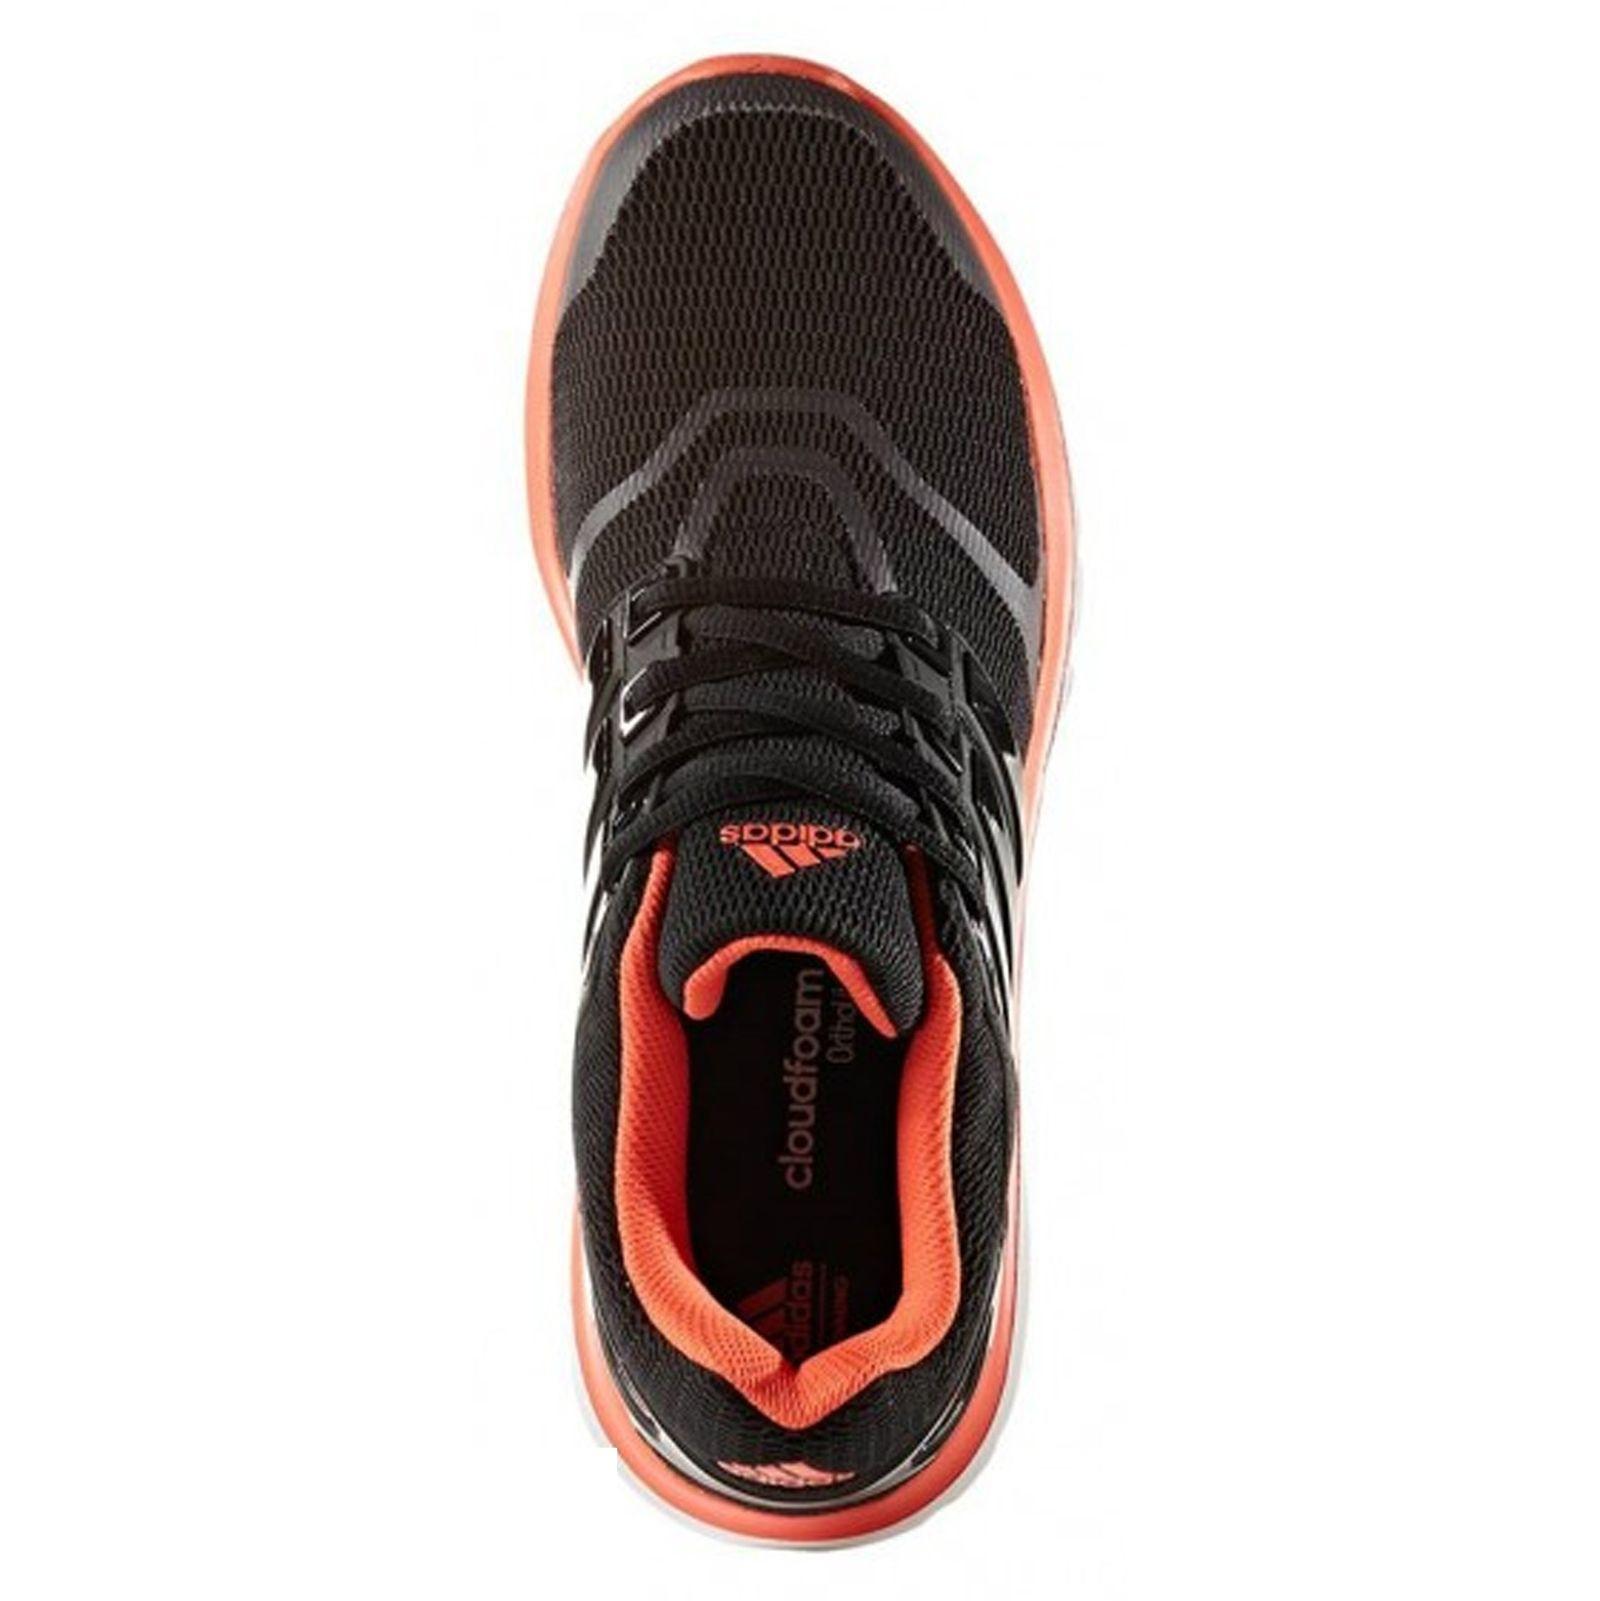 کفش دویدن بندی زنانه Energy Cloud V - آدیداس - مشکي و نارنجي - 2